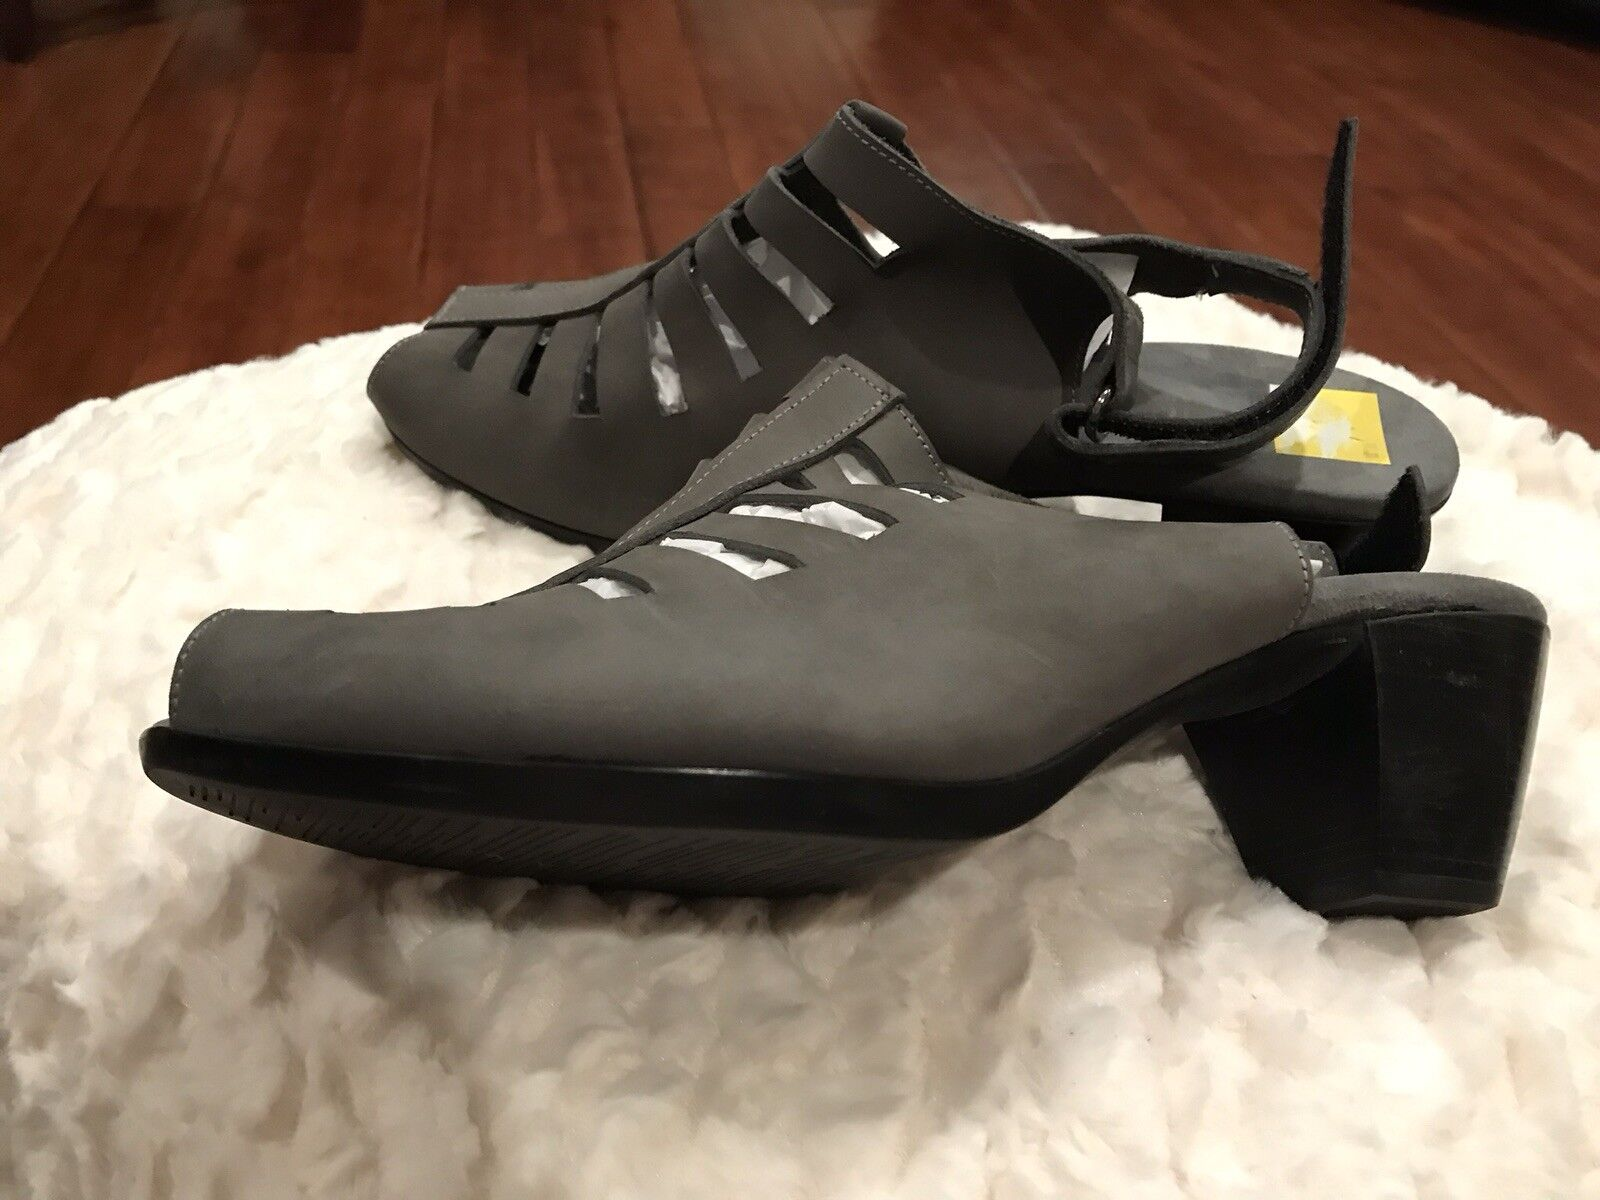 Munro Abby Sling Back Size 11WW Grey Nubuck Sandals, Retail  189.95